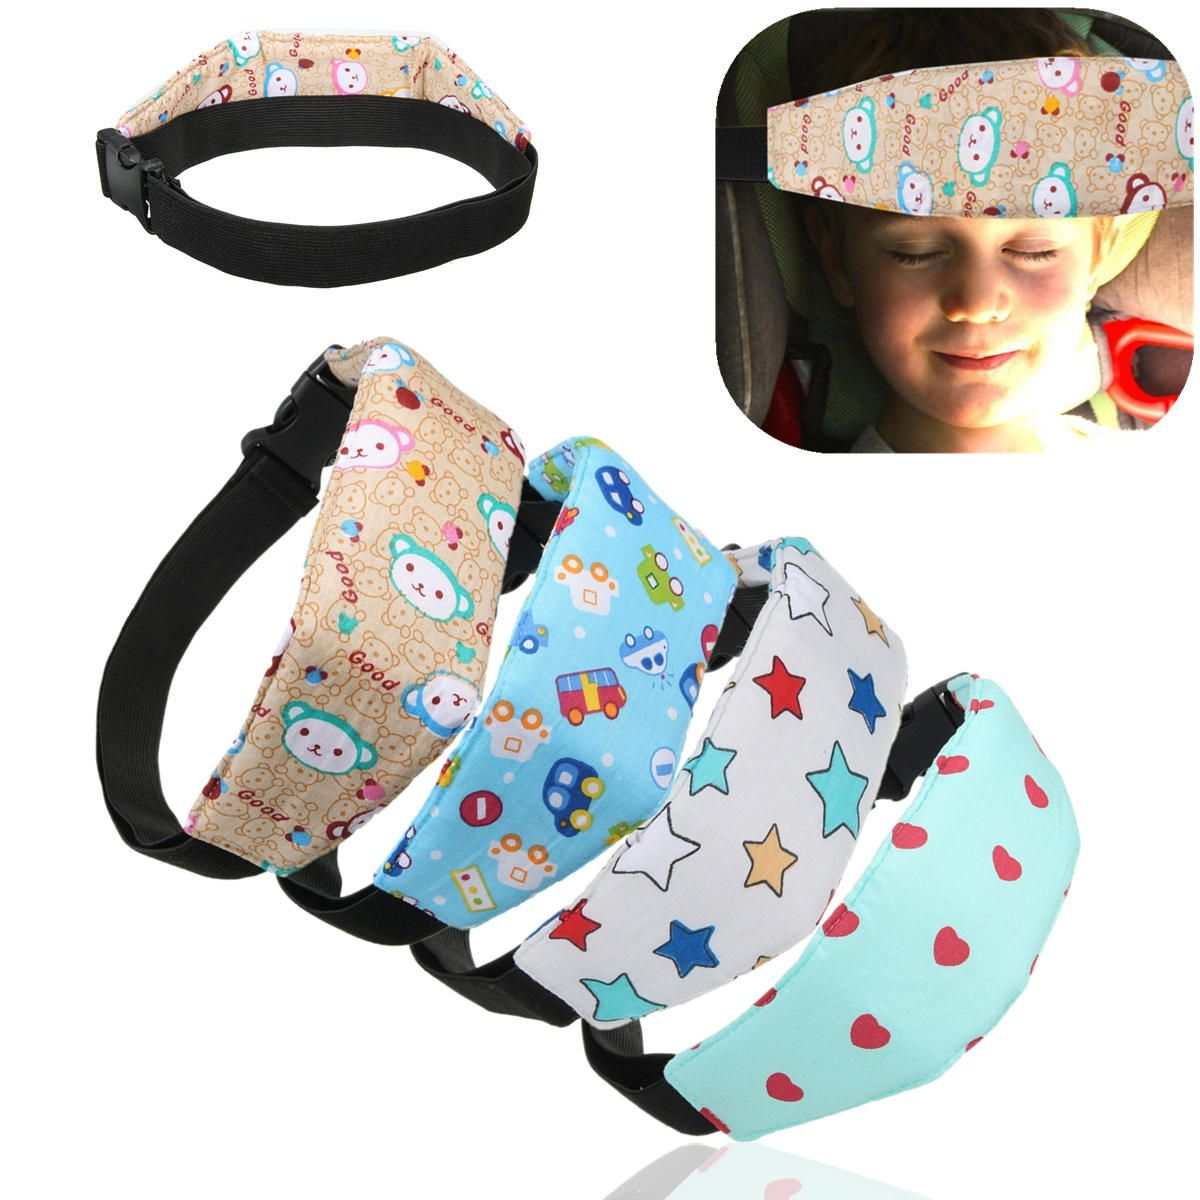 JJU US$6.15 Baby Safety Car Seat Sleep Nap Aid Child Kid Head Support Holder Protector Belt